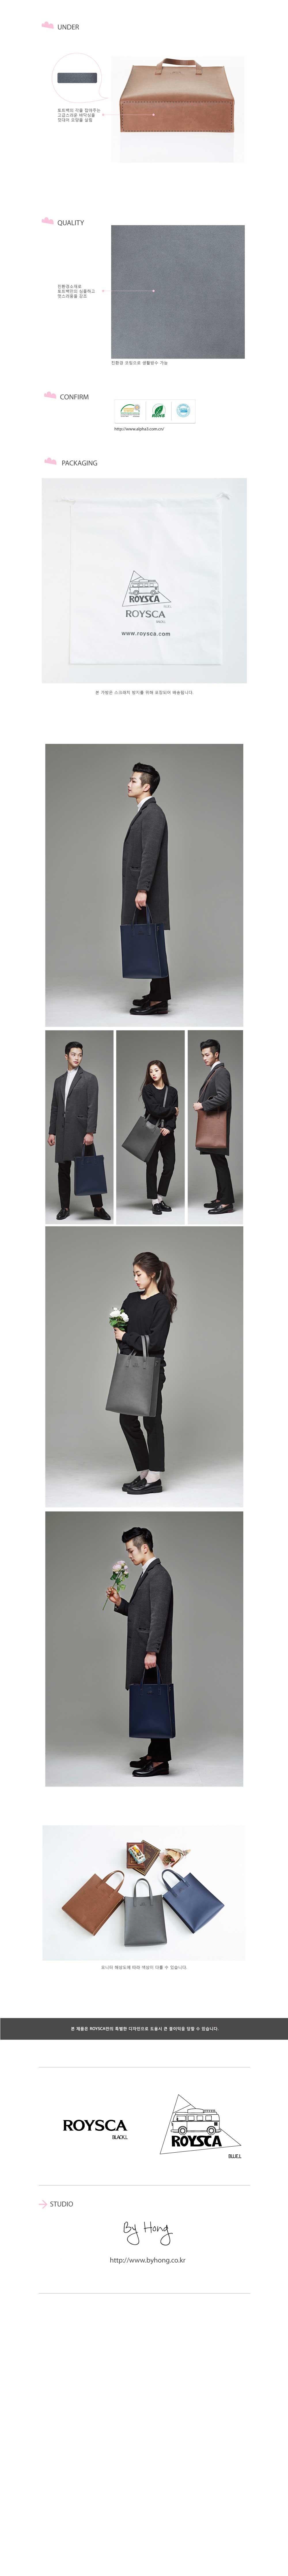 ROYSCA BLACK LINE TOTE BACK_NAVY - 로이스카, 49,000원, 토트백, 인조가죽토트백